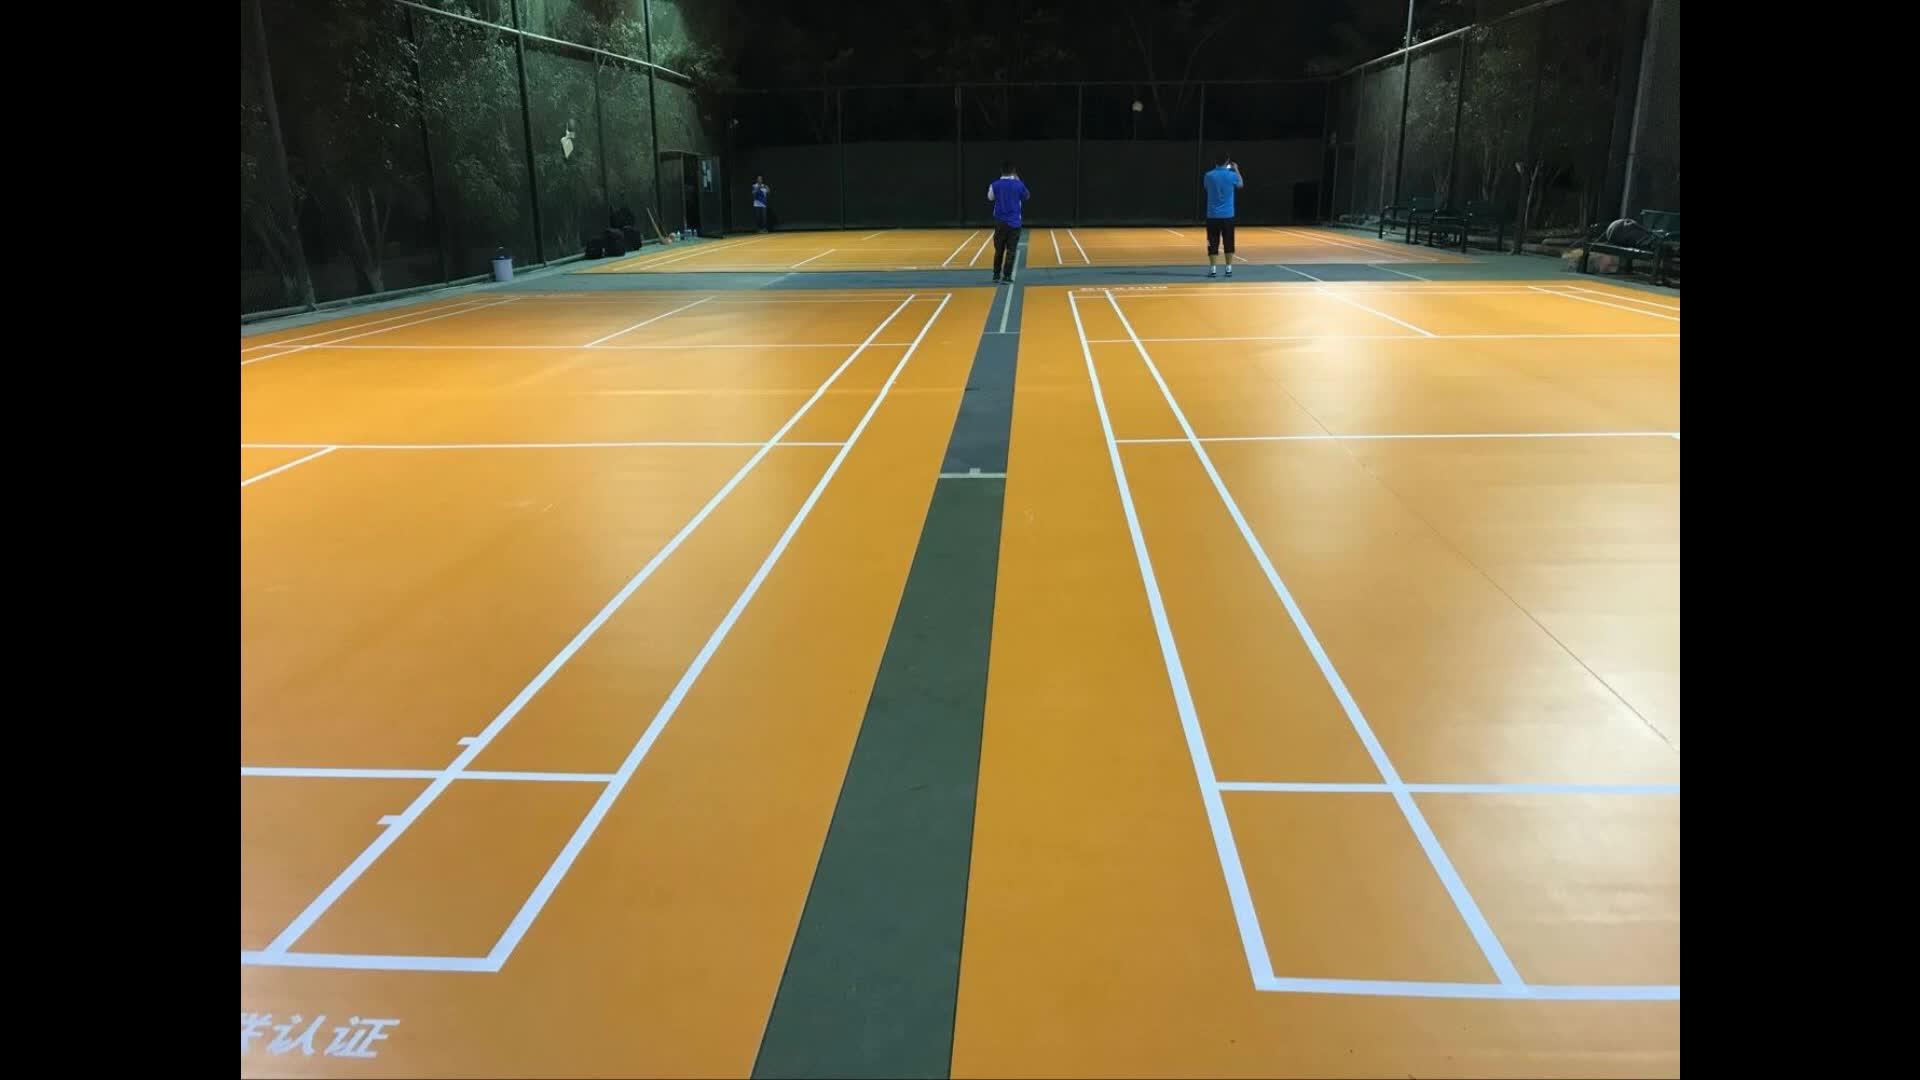 Enlio Badminton mat with BWF Certification